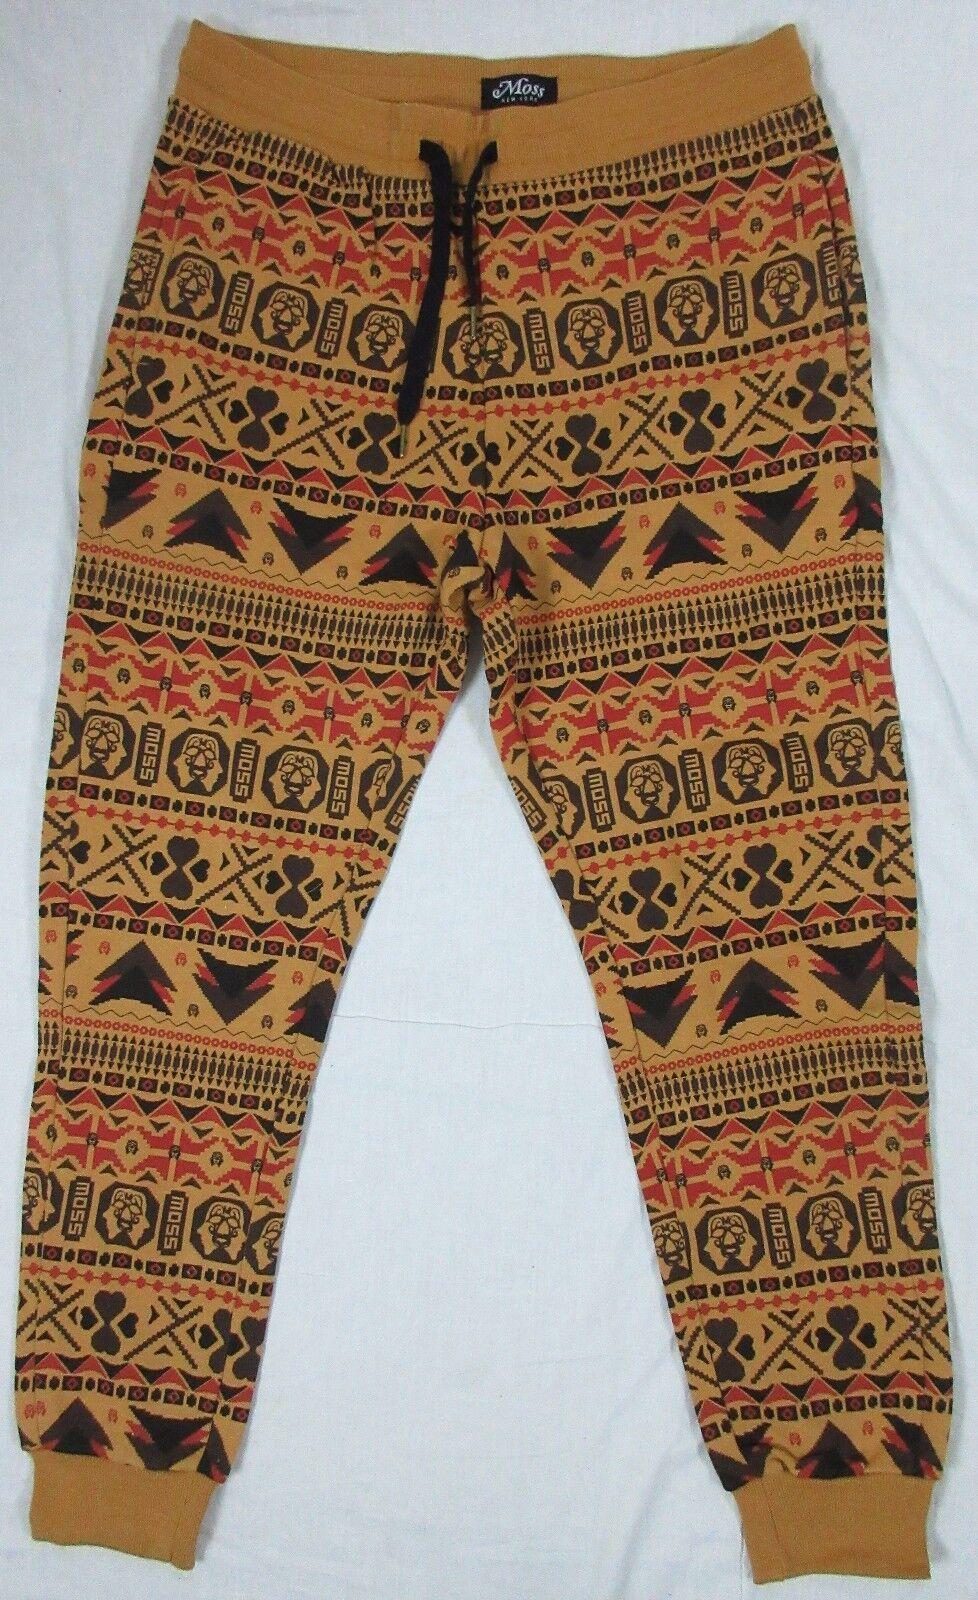 MOSS NEW YORK AZTEC PRINTED SWEAT PANTS MULTI SIZE 34, 36